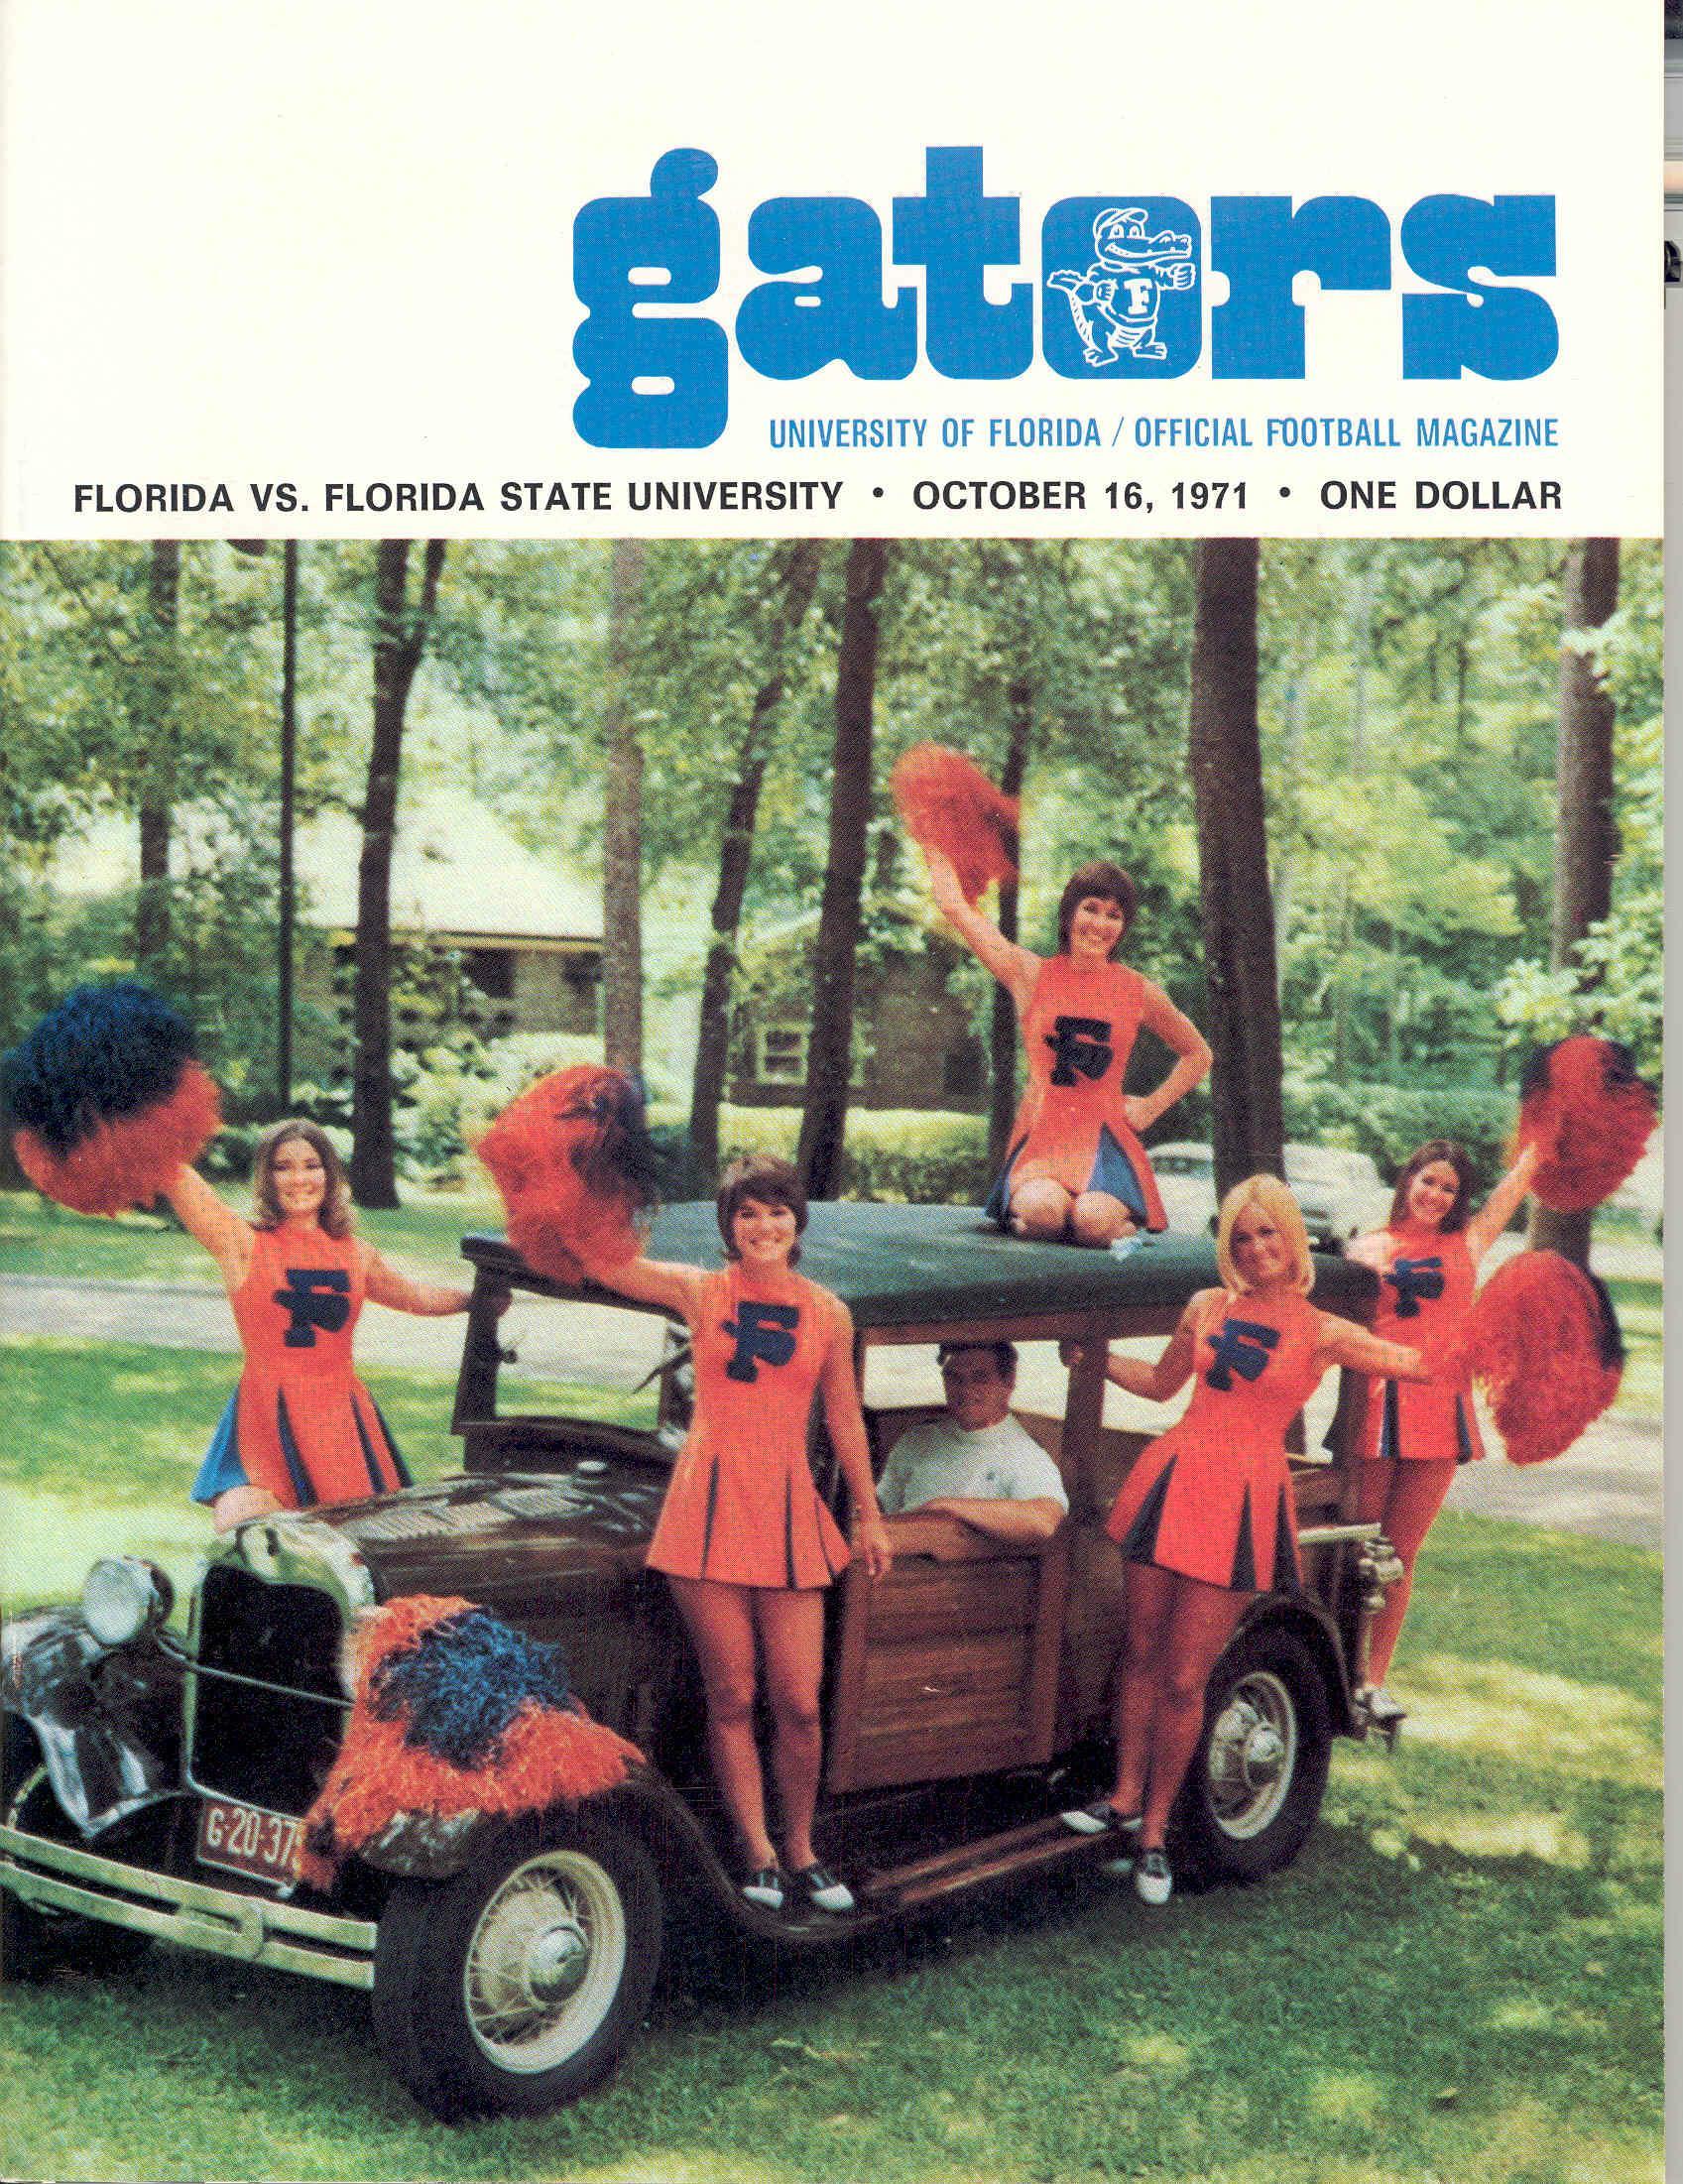 1971 Florida vs. Florida State